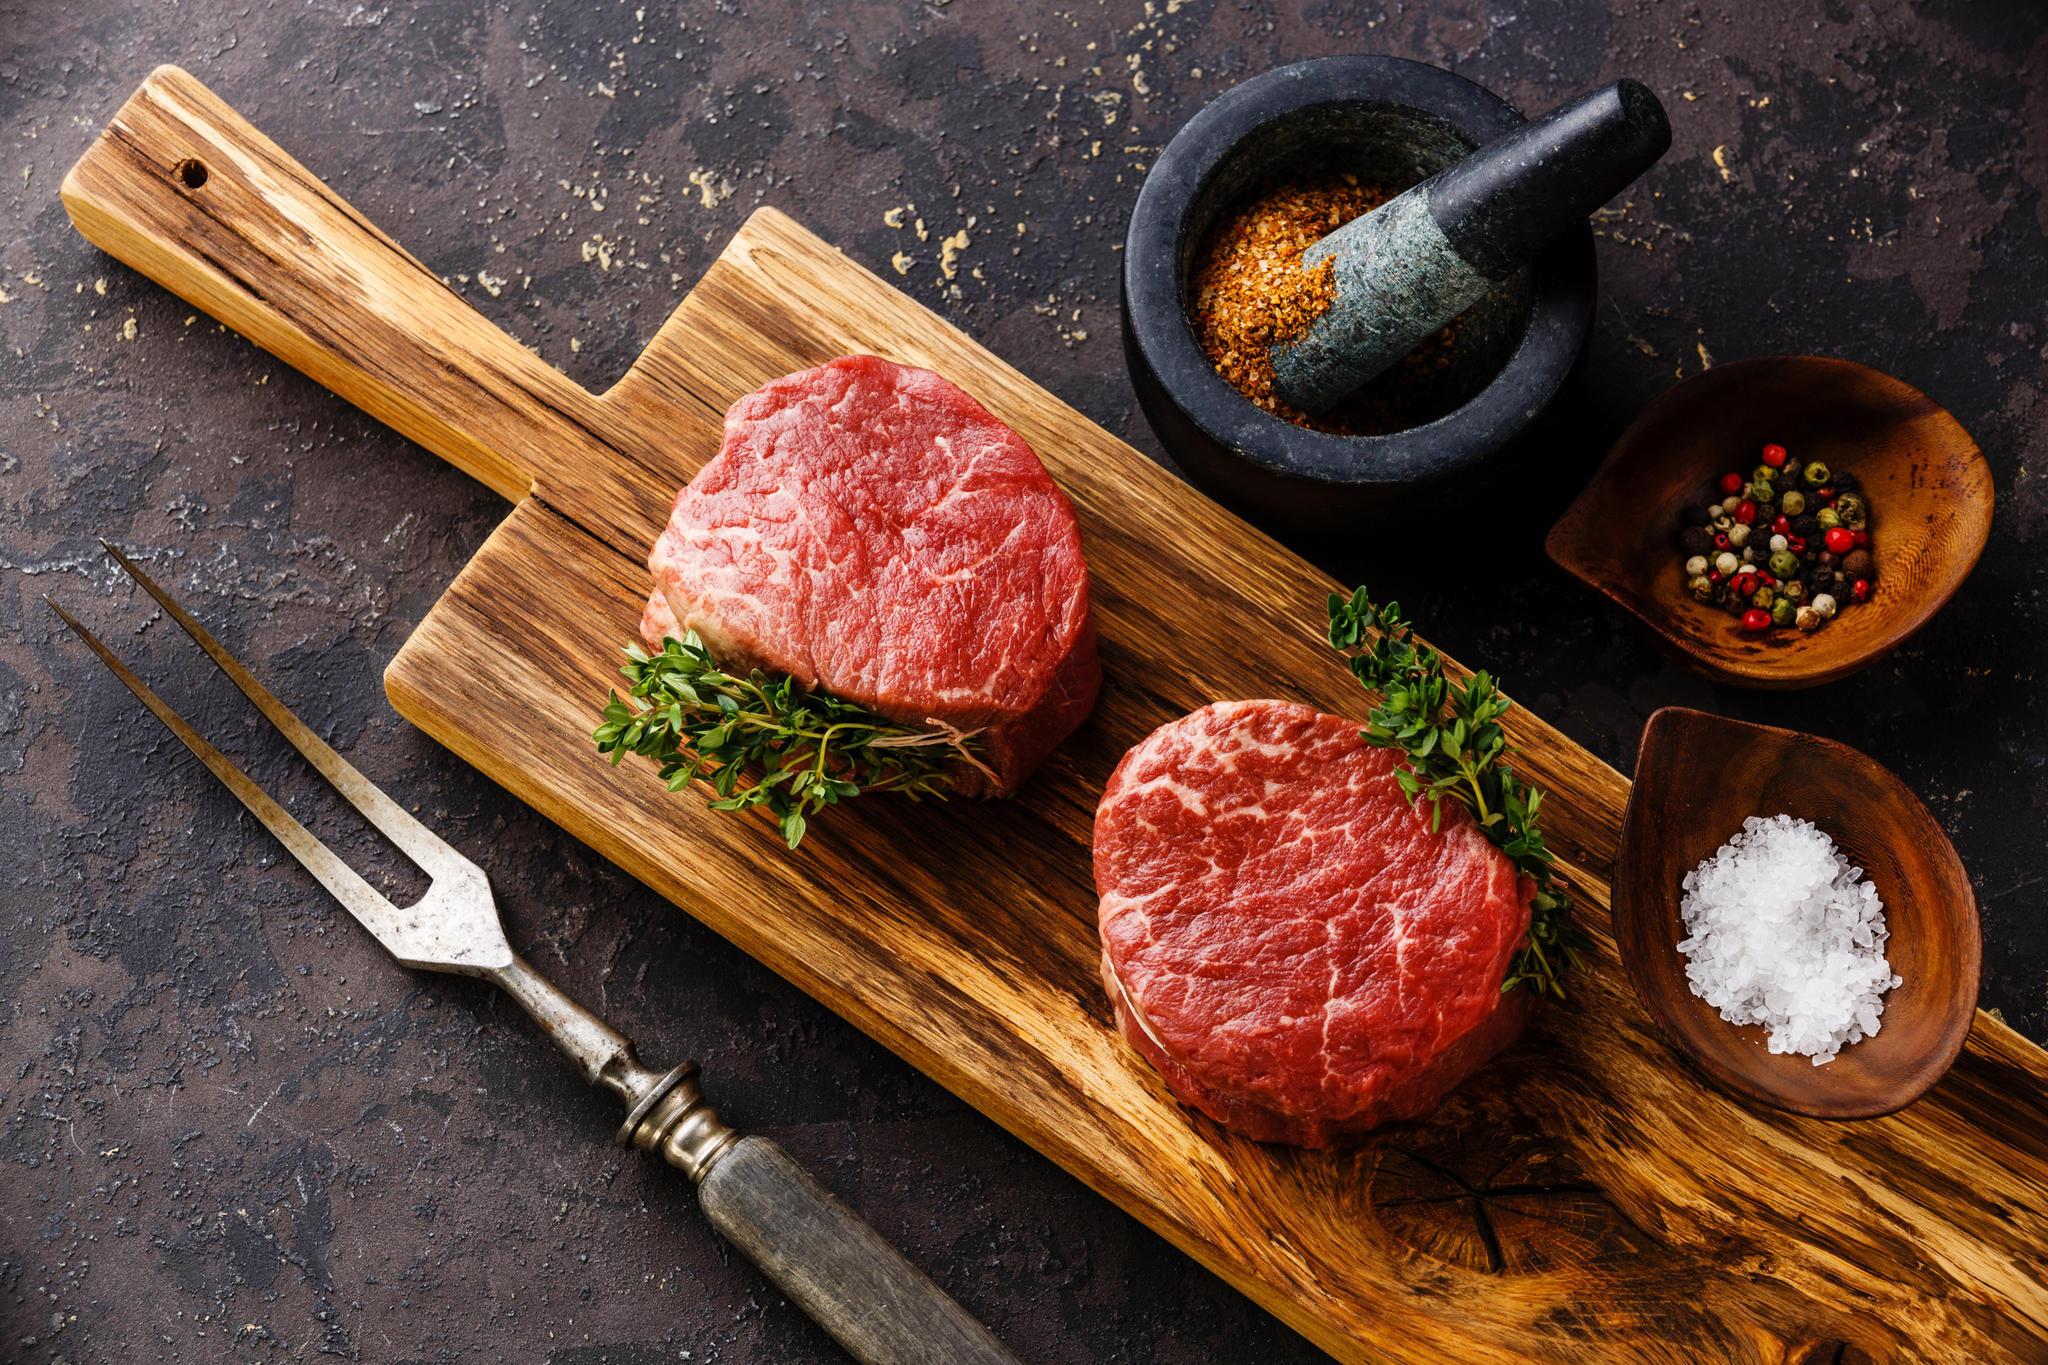 Weber Elektrogrill Steak : Rinderfilet grillen: so gelingt es dir! brigitte.de